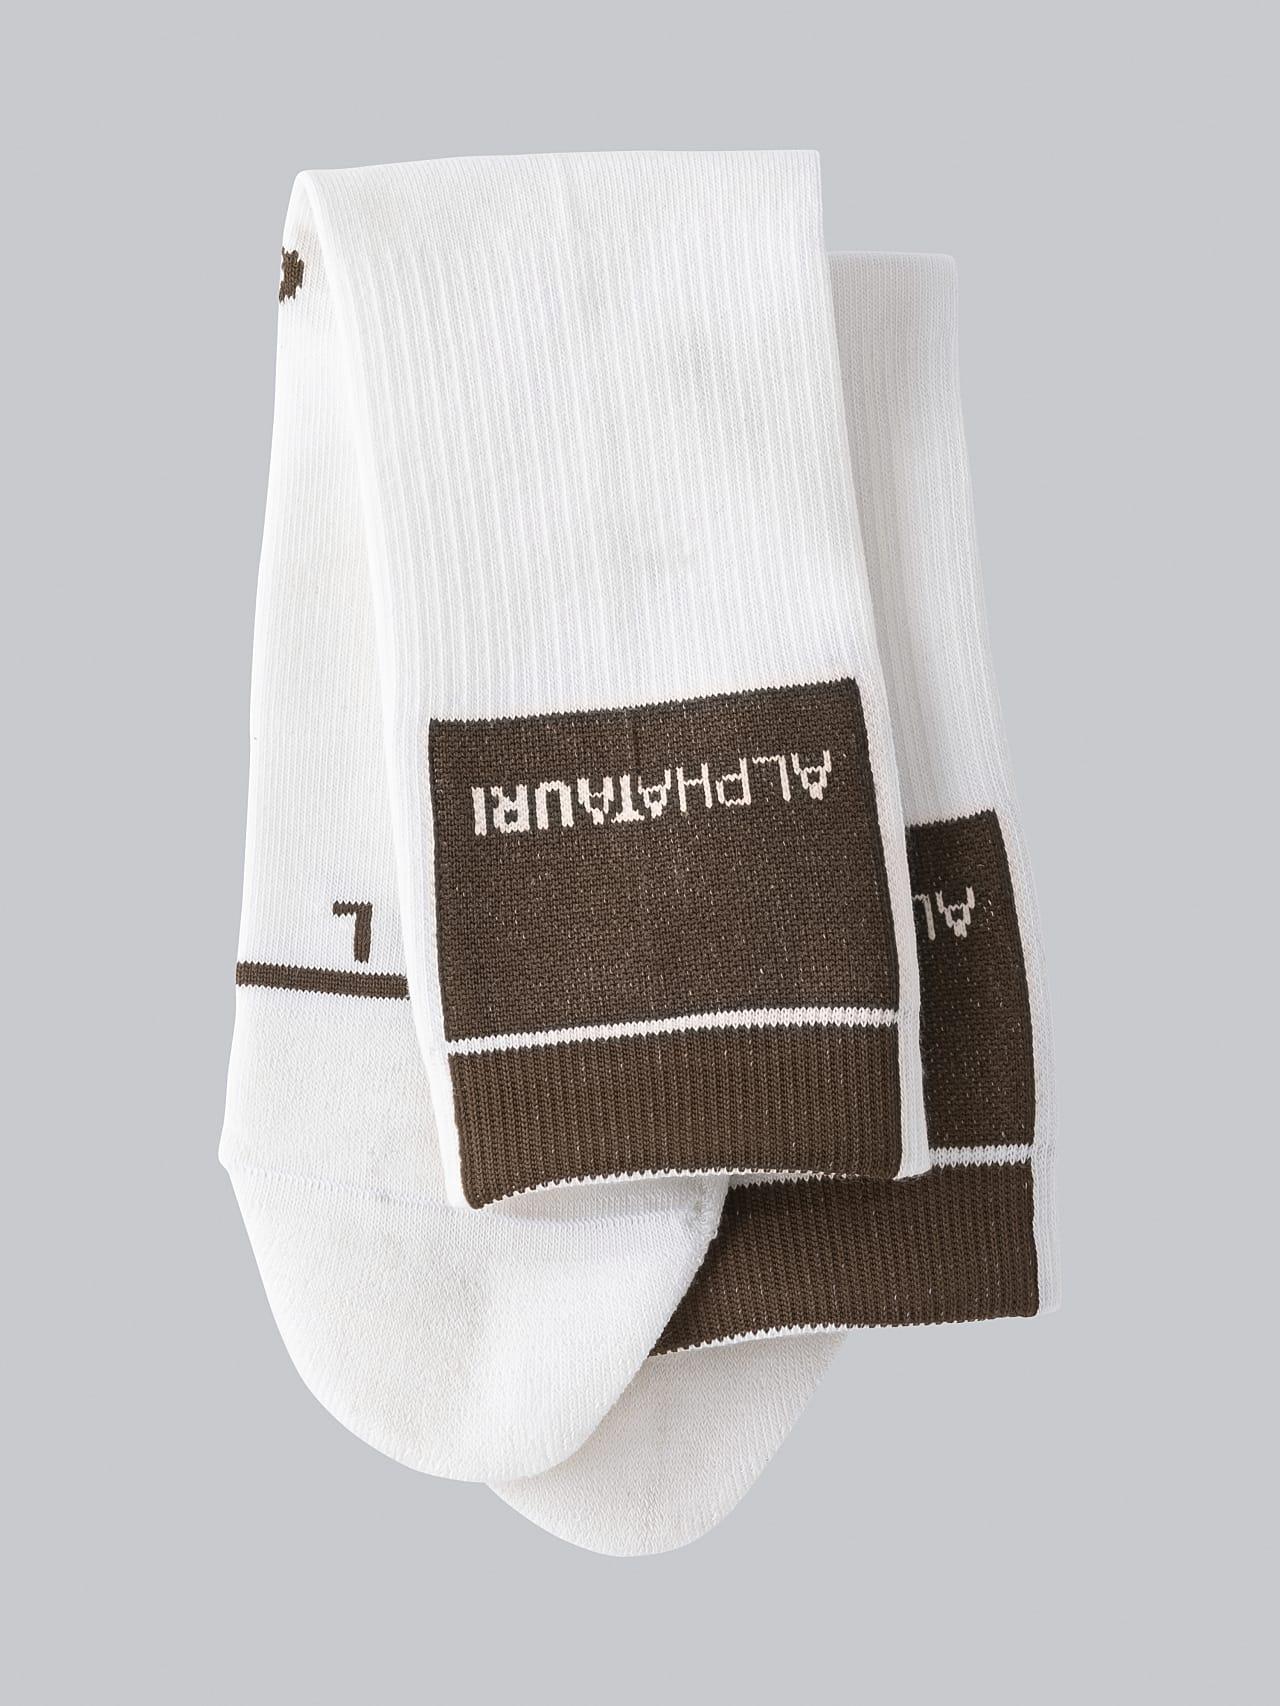 ATENI V3.Y5.02 Premium Knit Socks offwhite Left Alpha Tauri